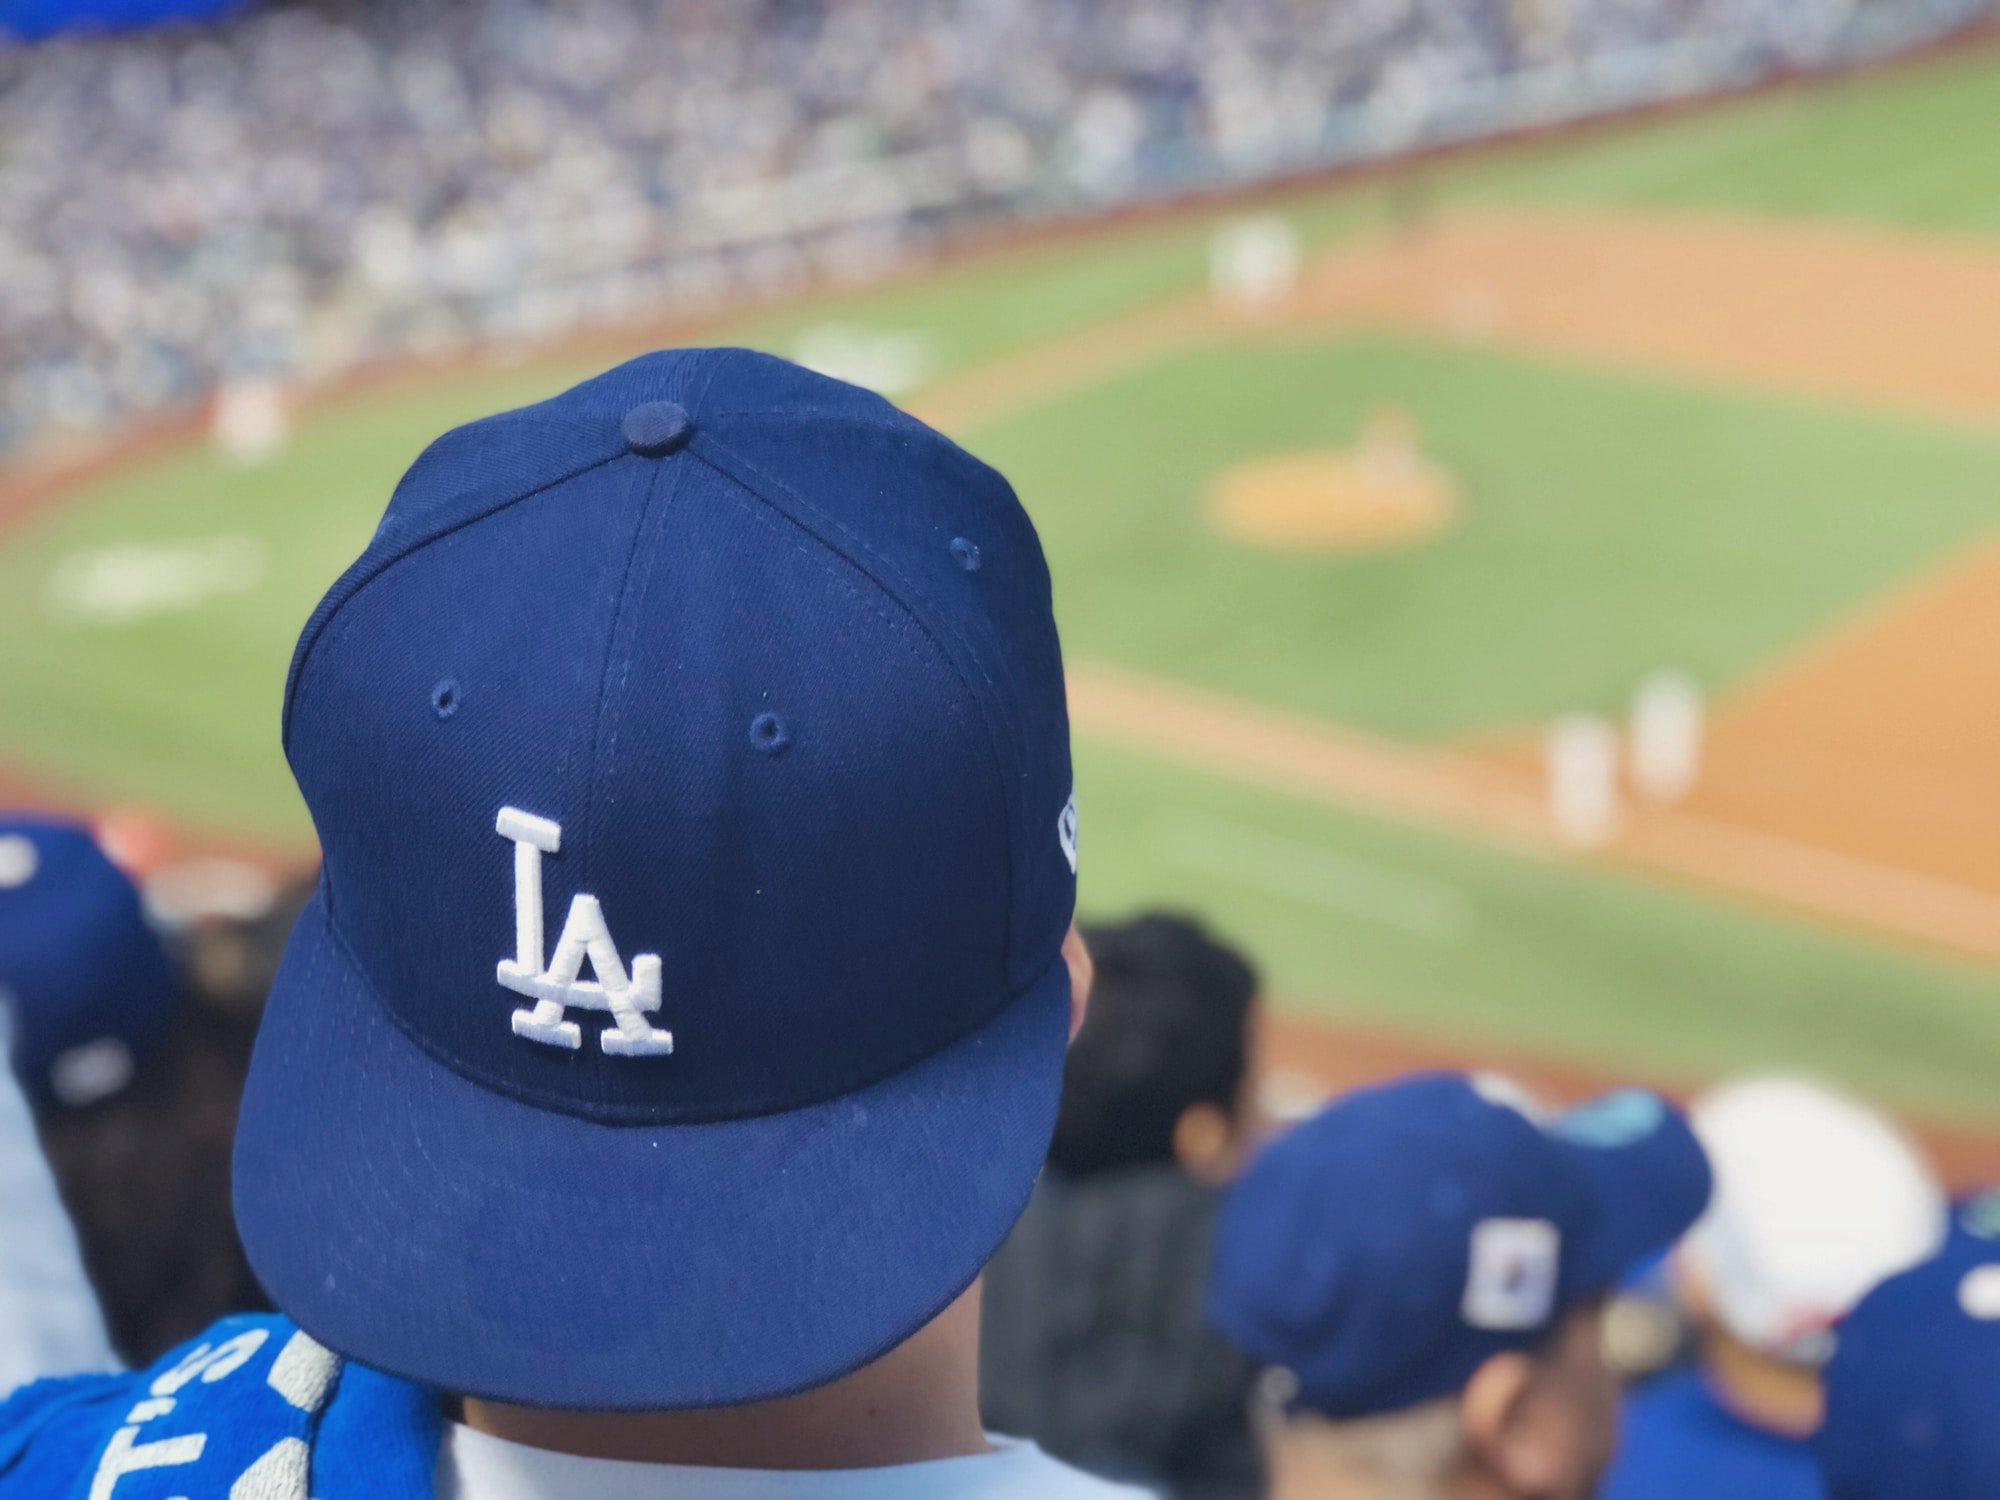 World Series Odds: Dodgers Still Favored Ahead of MLB All-Star Break